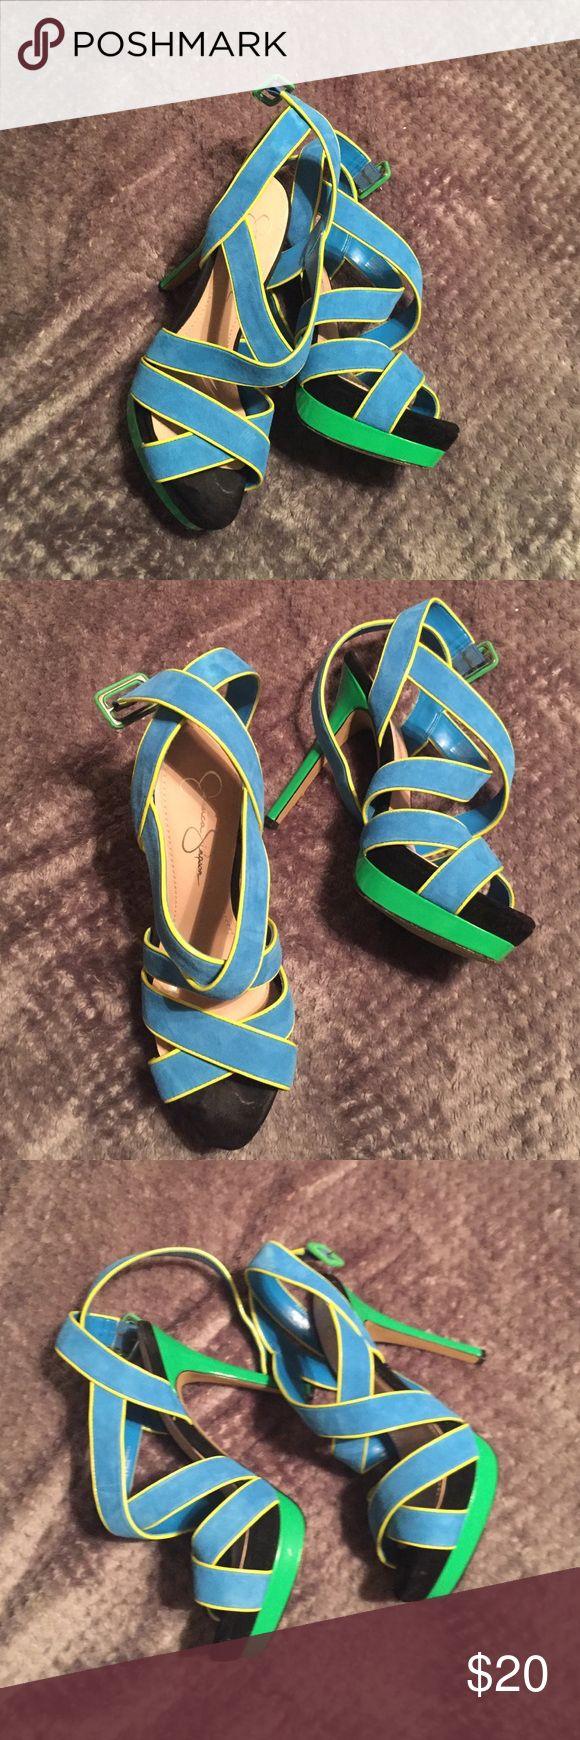 Jessica Simpson pump heels Blue & green Jessica Simpson heels size 8 1/2. Good condition. Jessica Simpson Shoes Heels